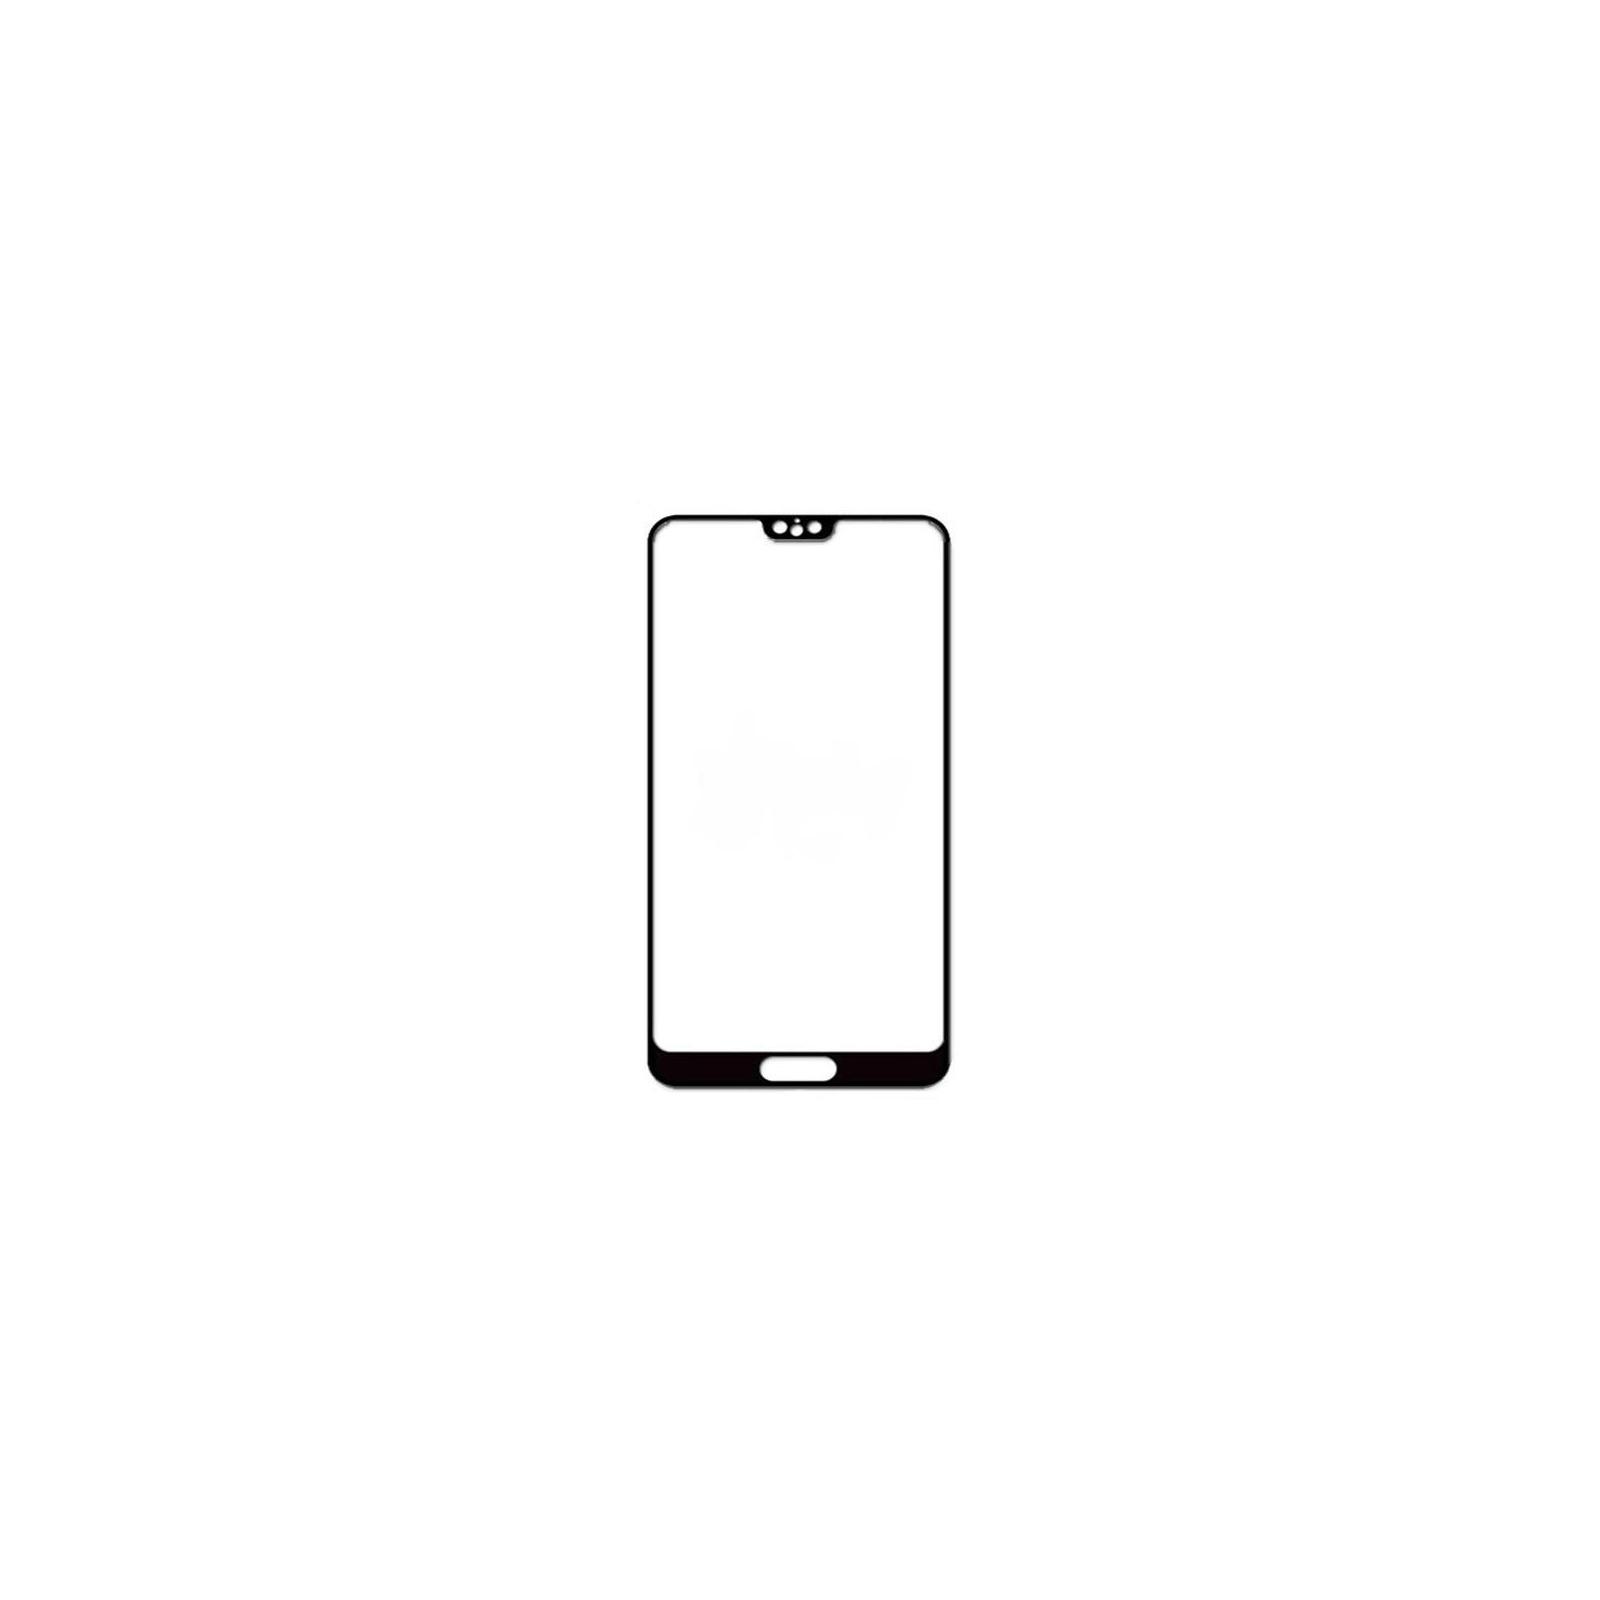 Стекло защитное Drobak для Huawei P20 Pro Black 3D Full Cover (448418) изображение 2